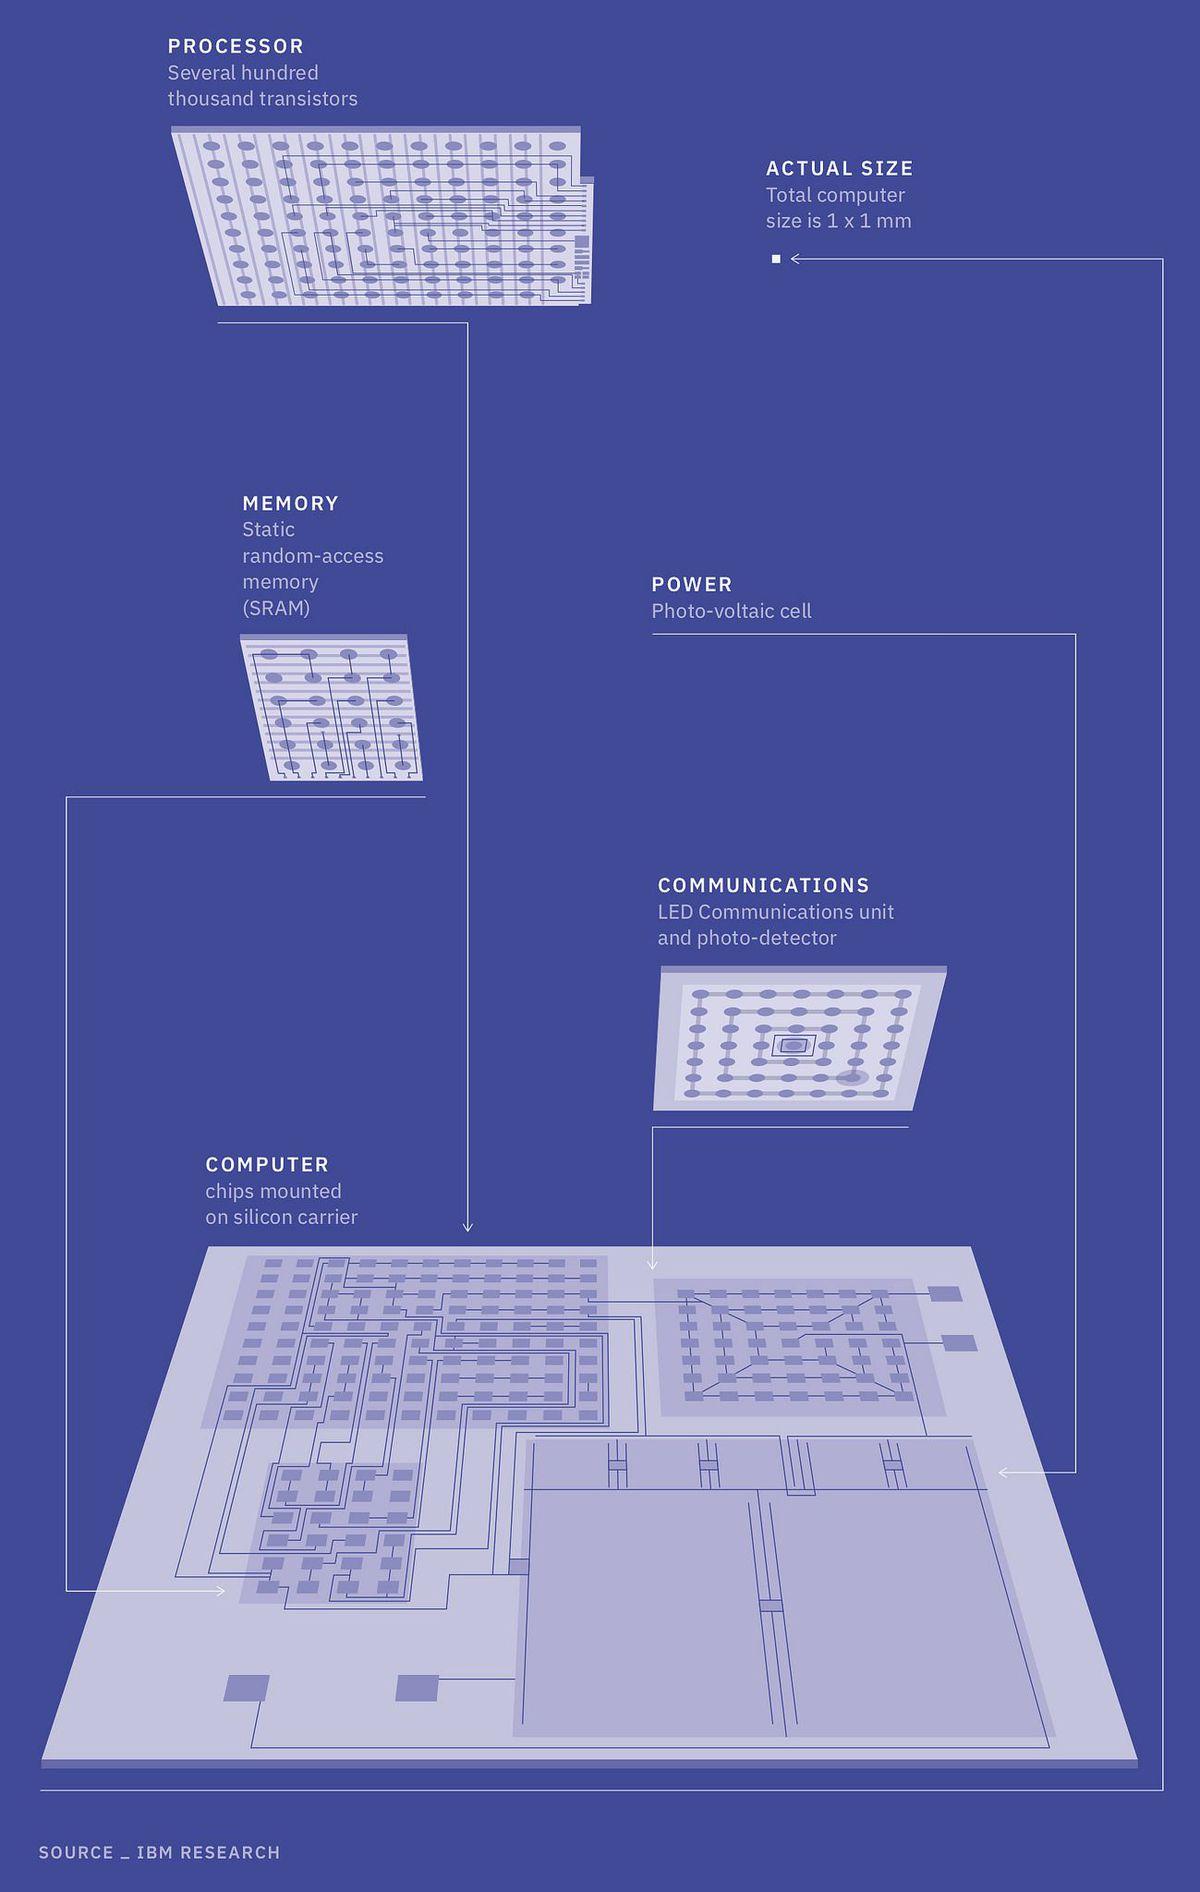 IBM - budowa komputer